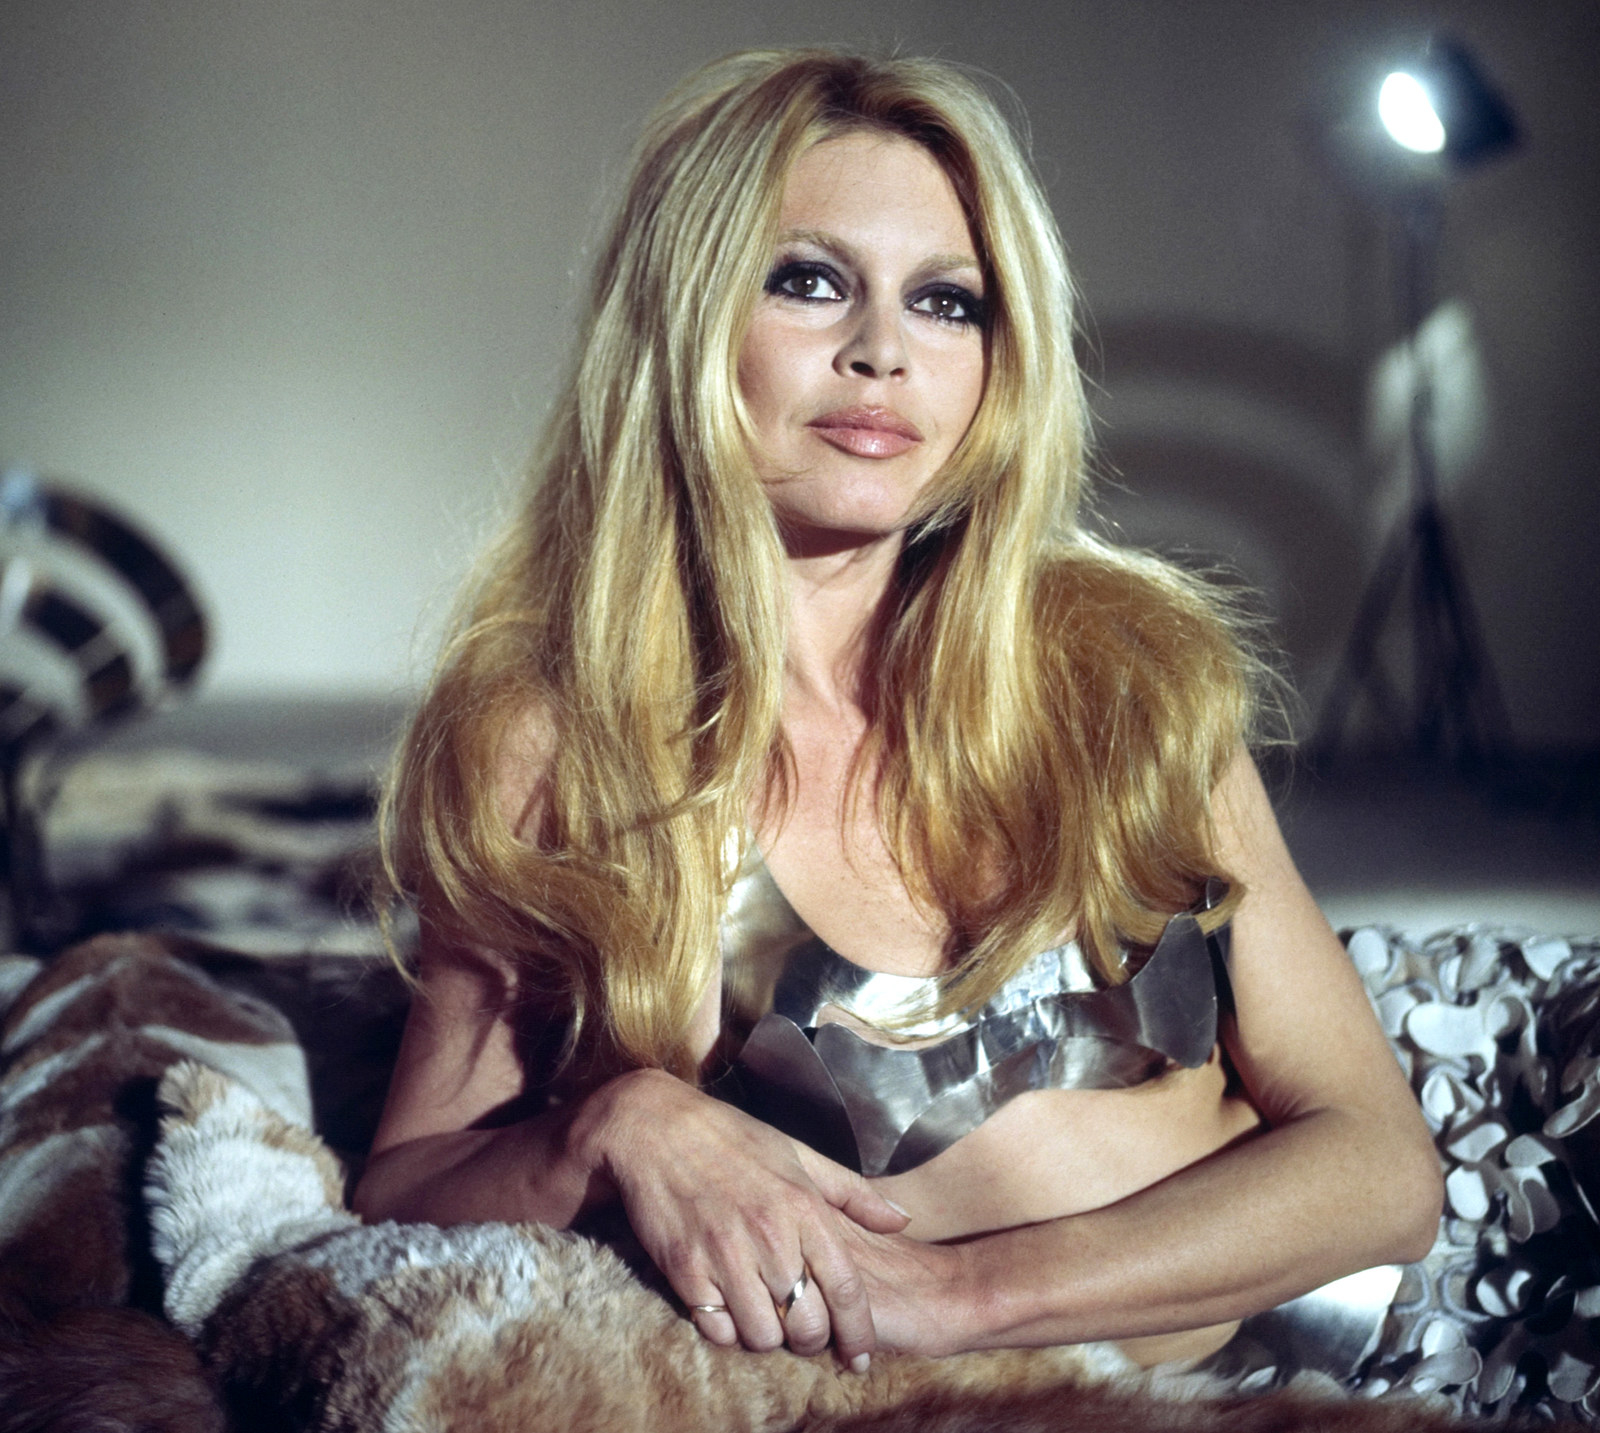 Brigitte Bardot on the set of the French program Sacha Show on March 13, 1969.